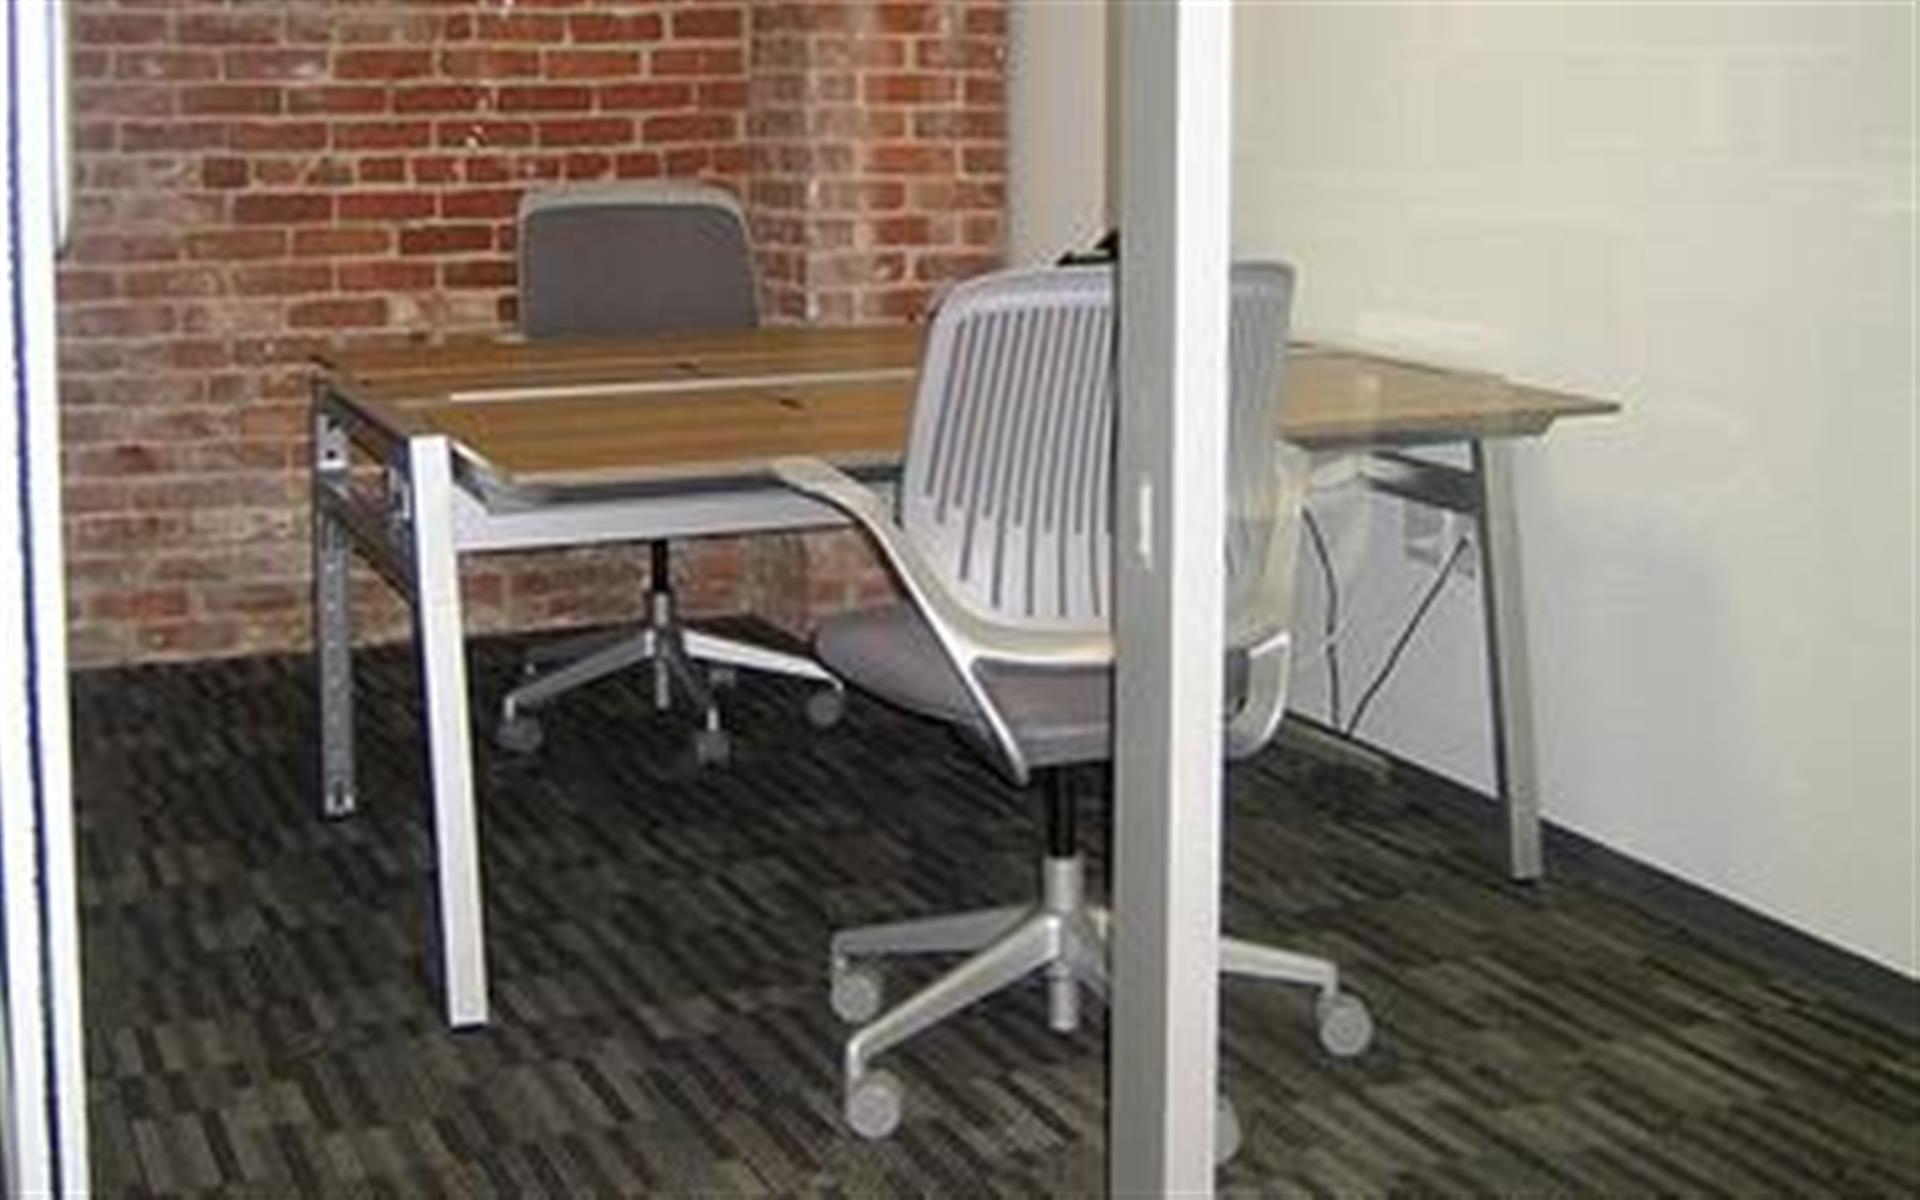 BLANKSPACES Santa Monica - Medium Office for 2